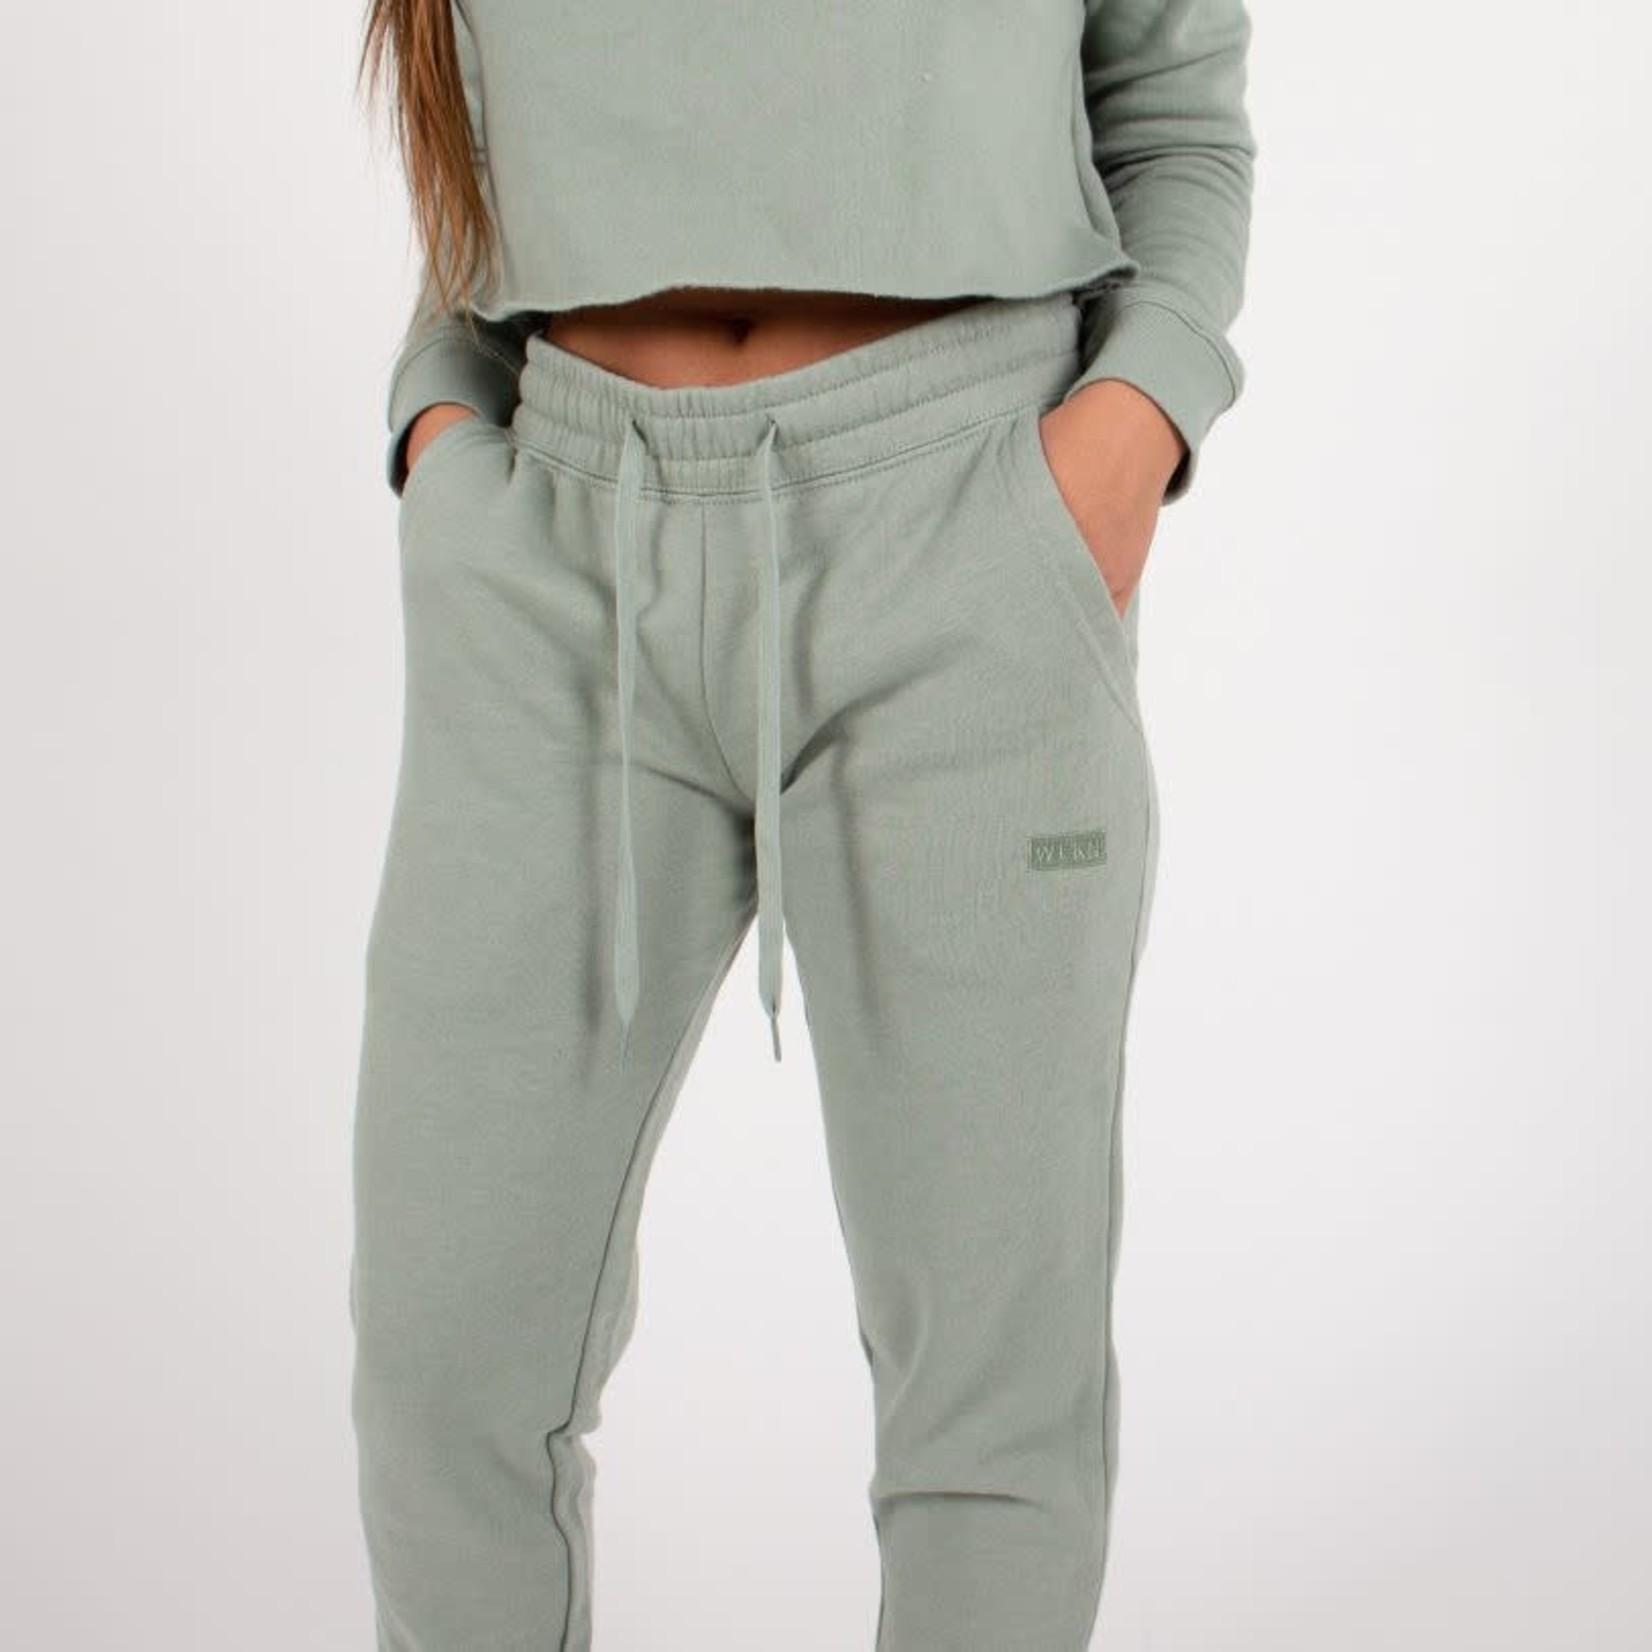 WLKN WLKN : Tonal Box Sweatpants